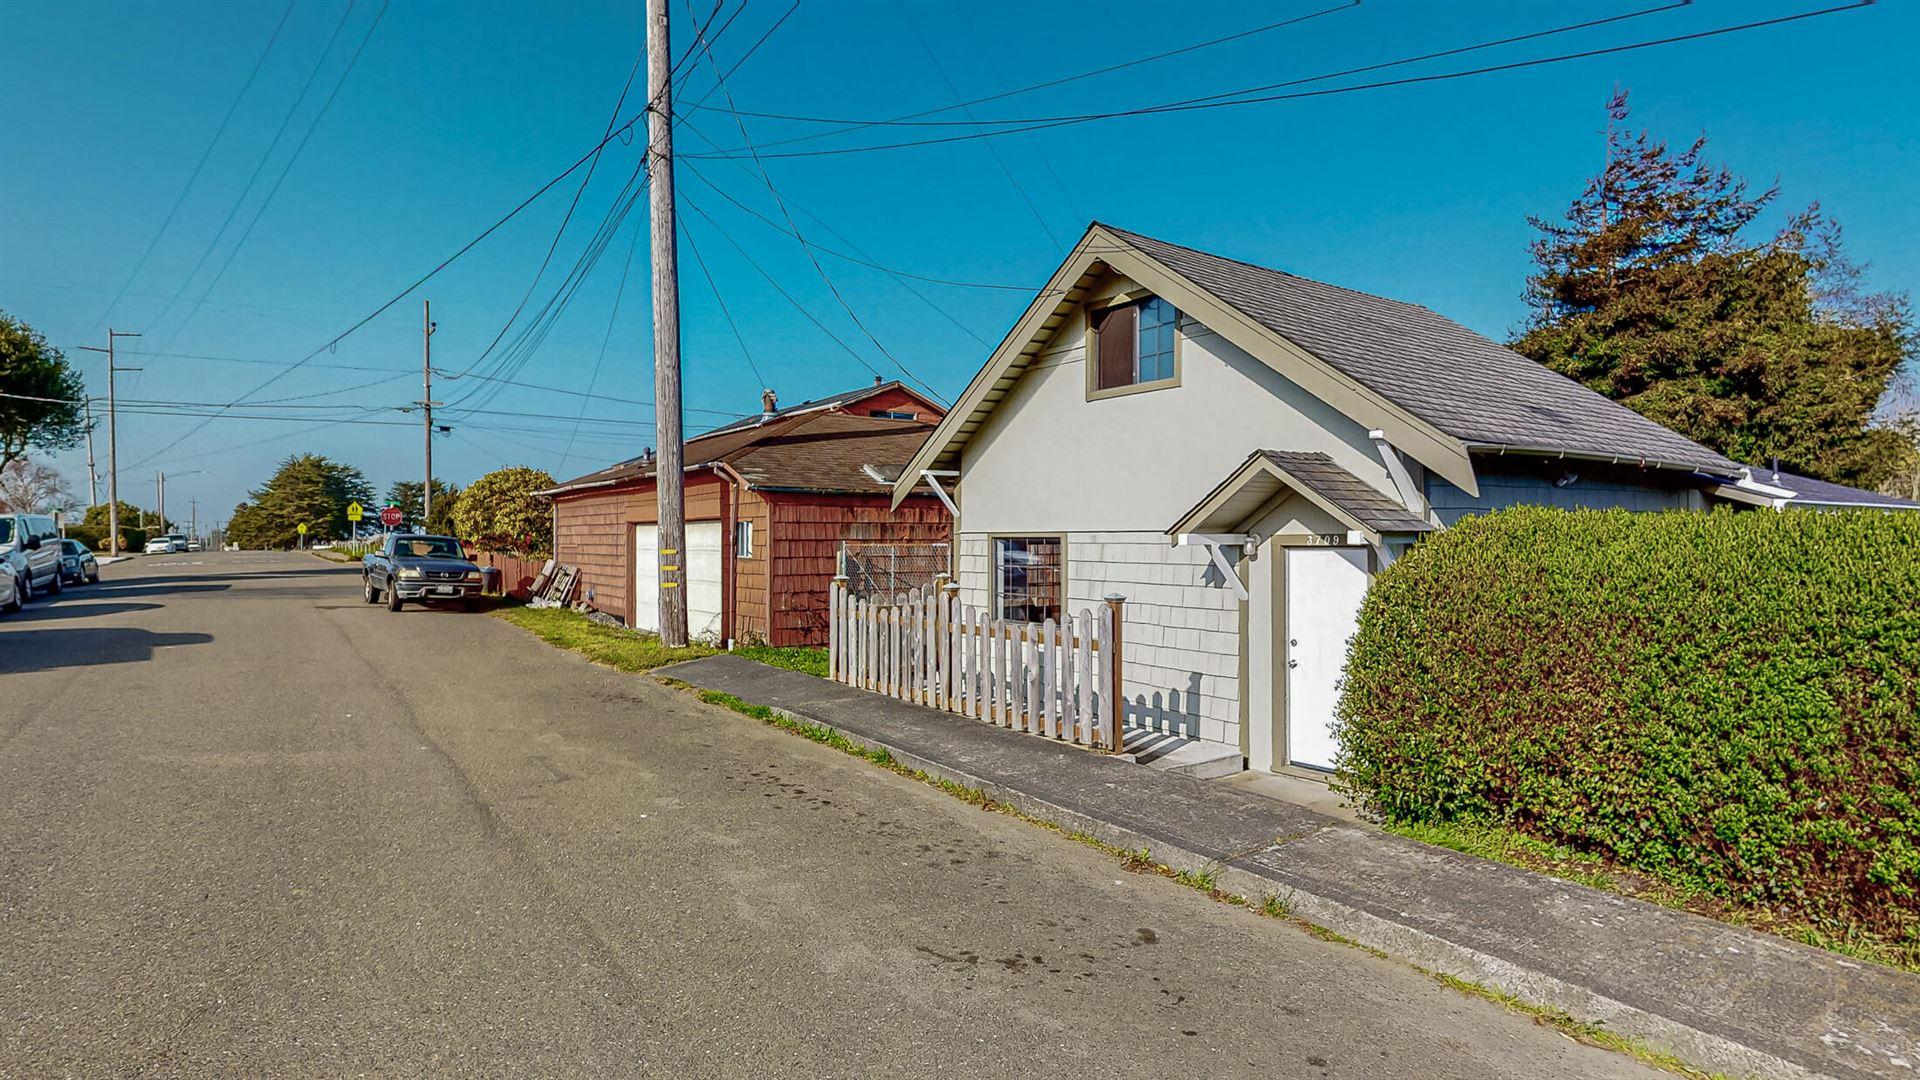 3709 Sunnyside Avenue, Eureka, CA 95501 - MLS#: 258680